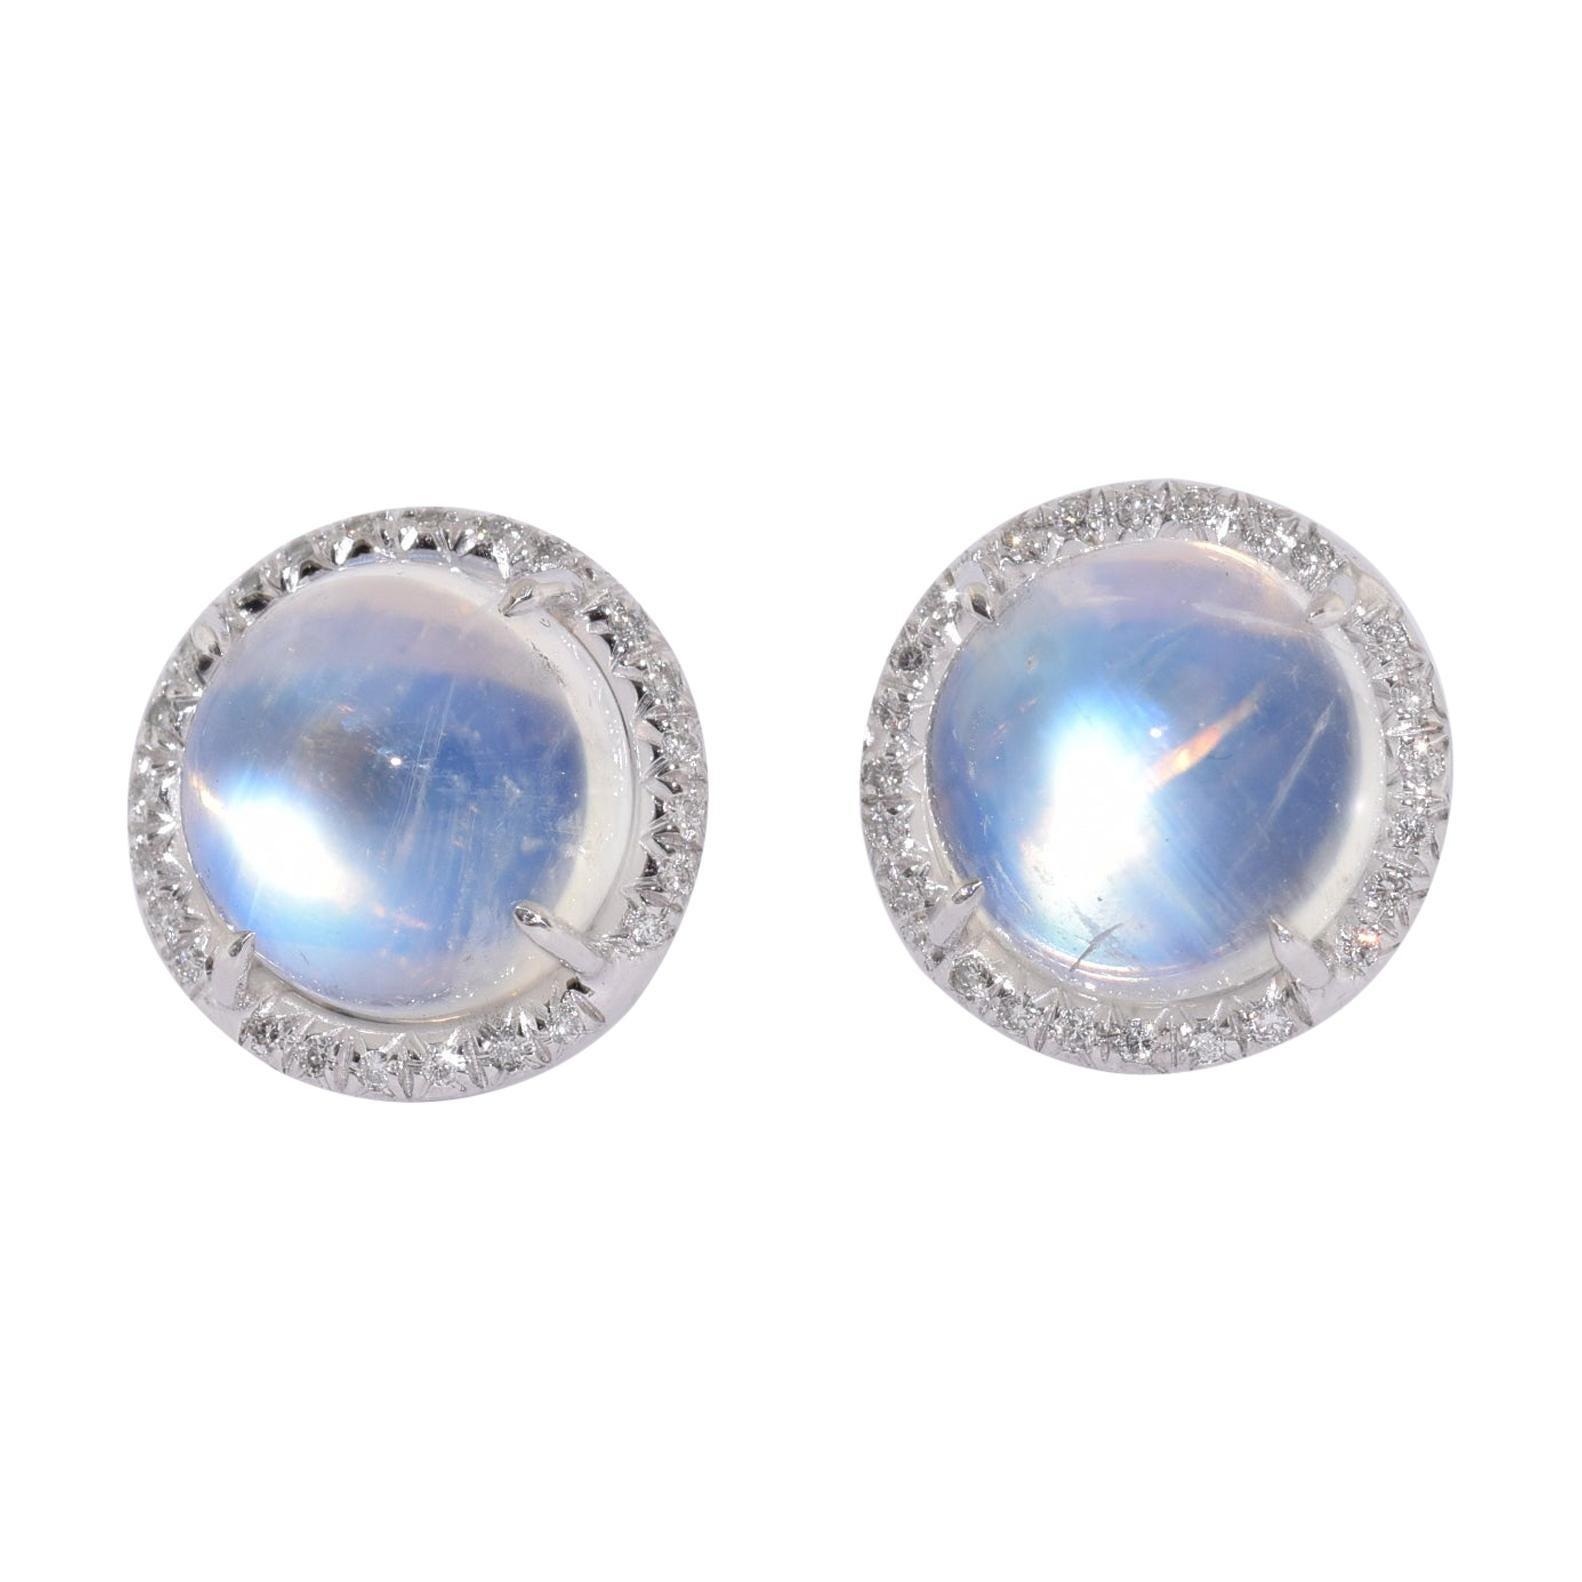 Fred Leighton Moonstone and Diamond Stud Earrings